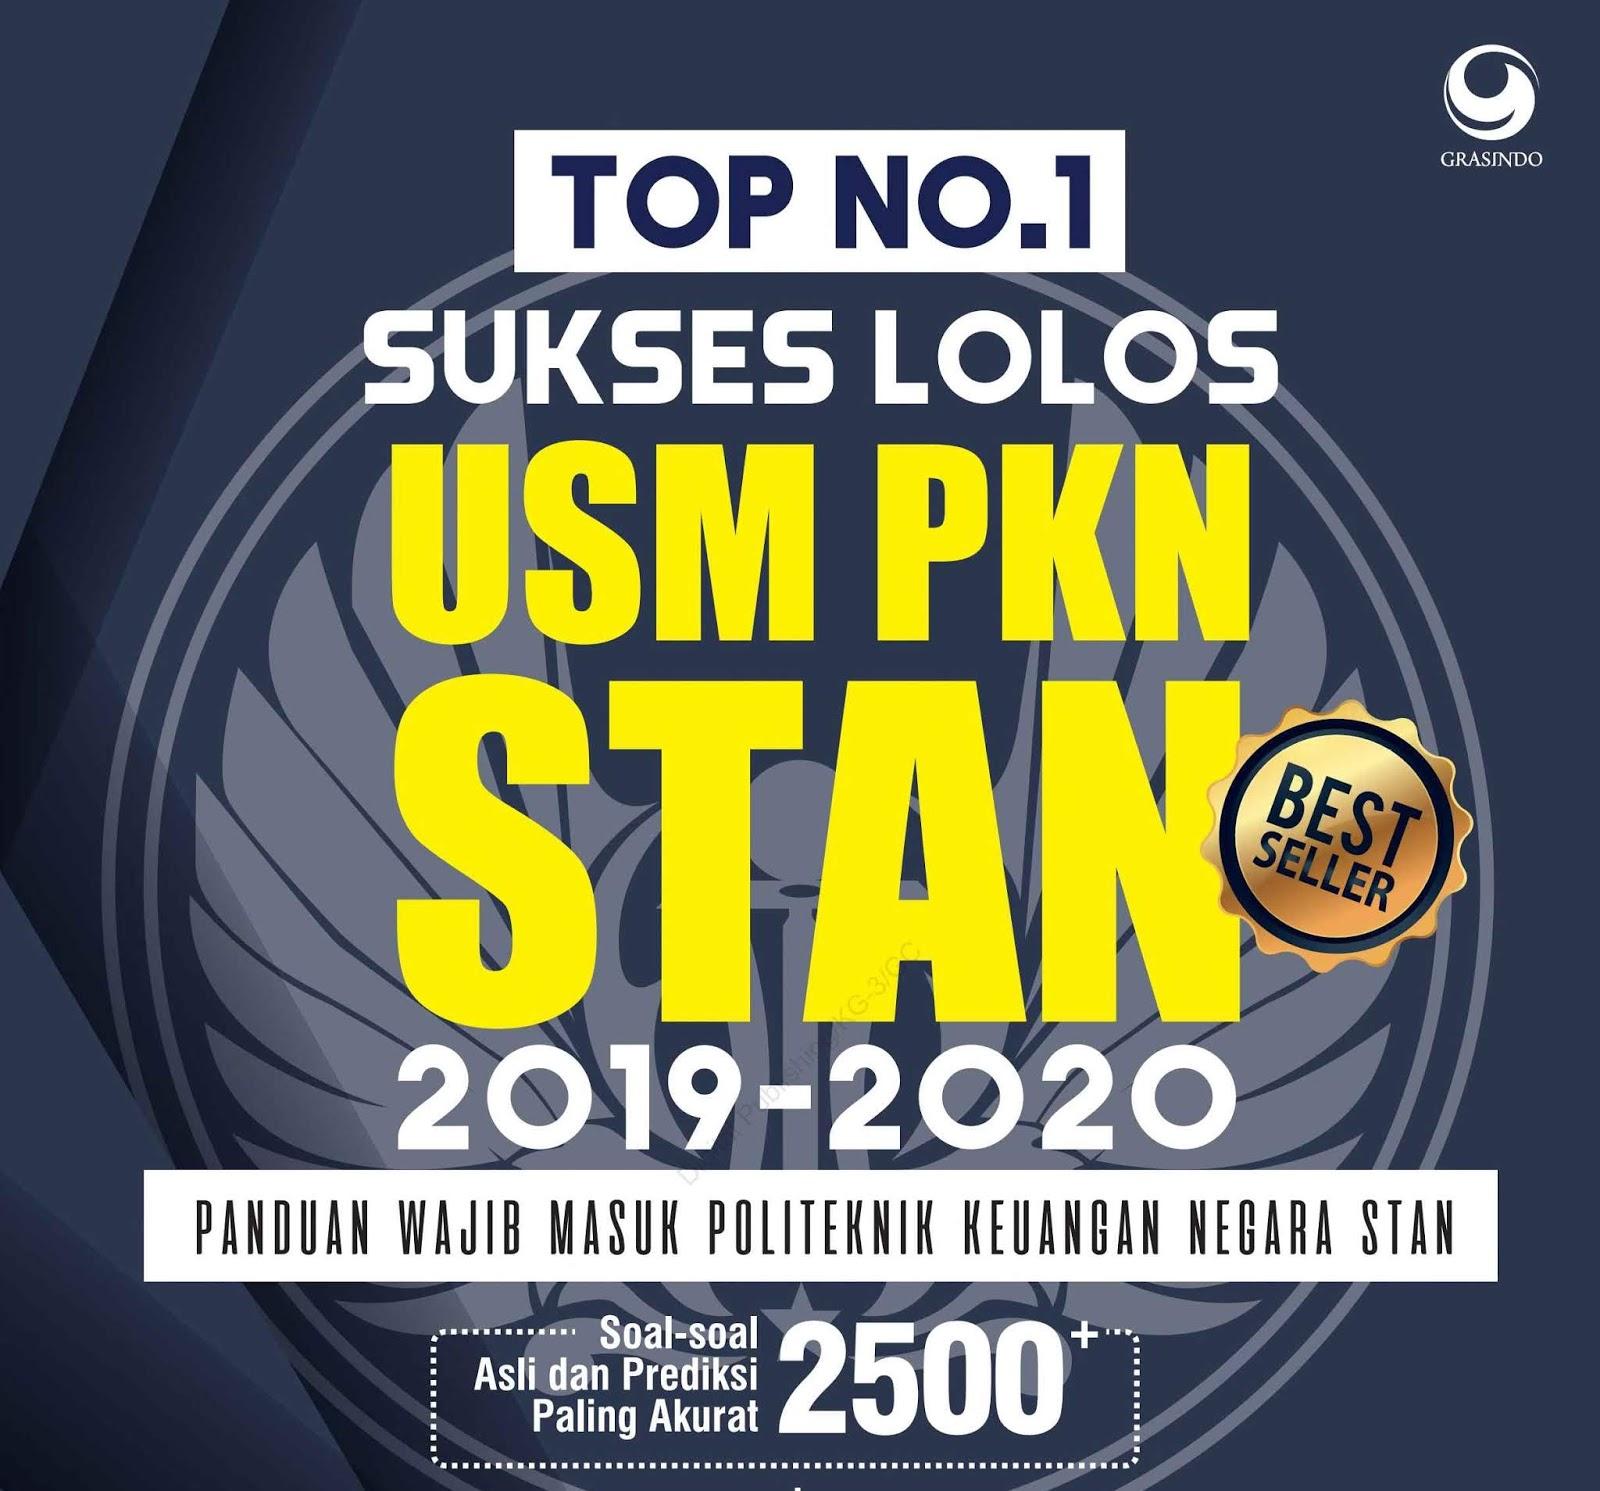 Top No.1 Sukses Lolos USM PKN STAN (Best Seller) 2019-2020